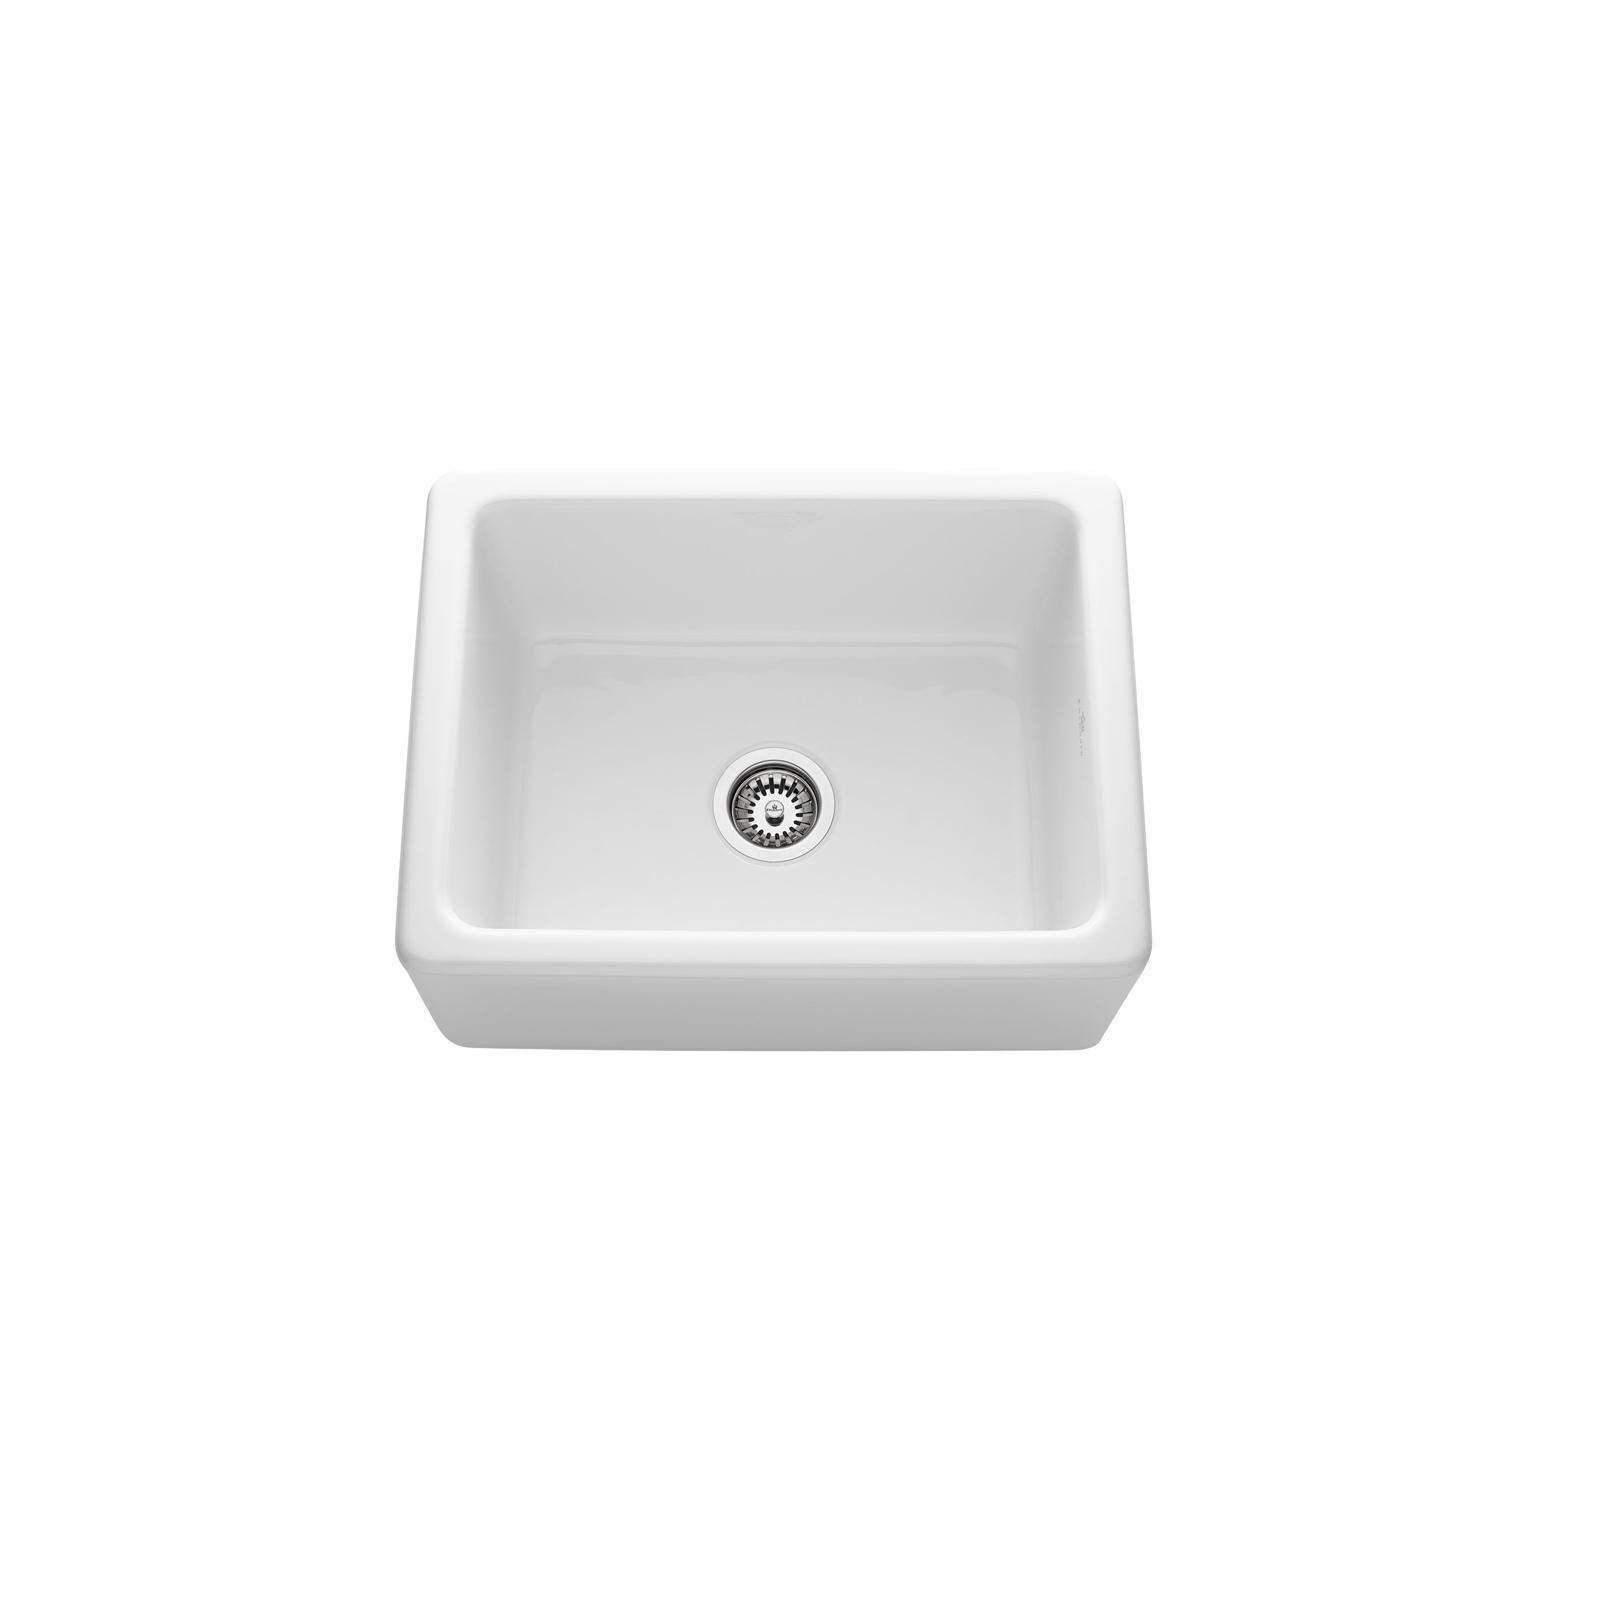 High-quality sink Philippe I - single bowl, ceramic